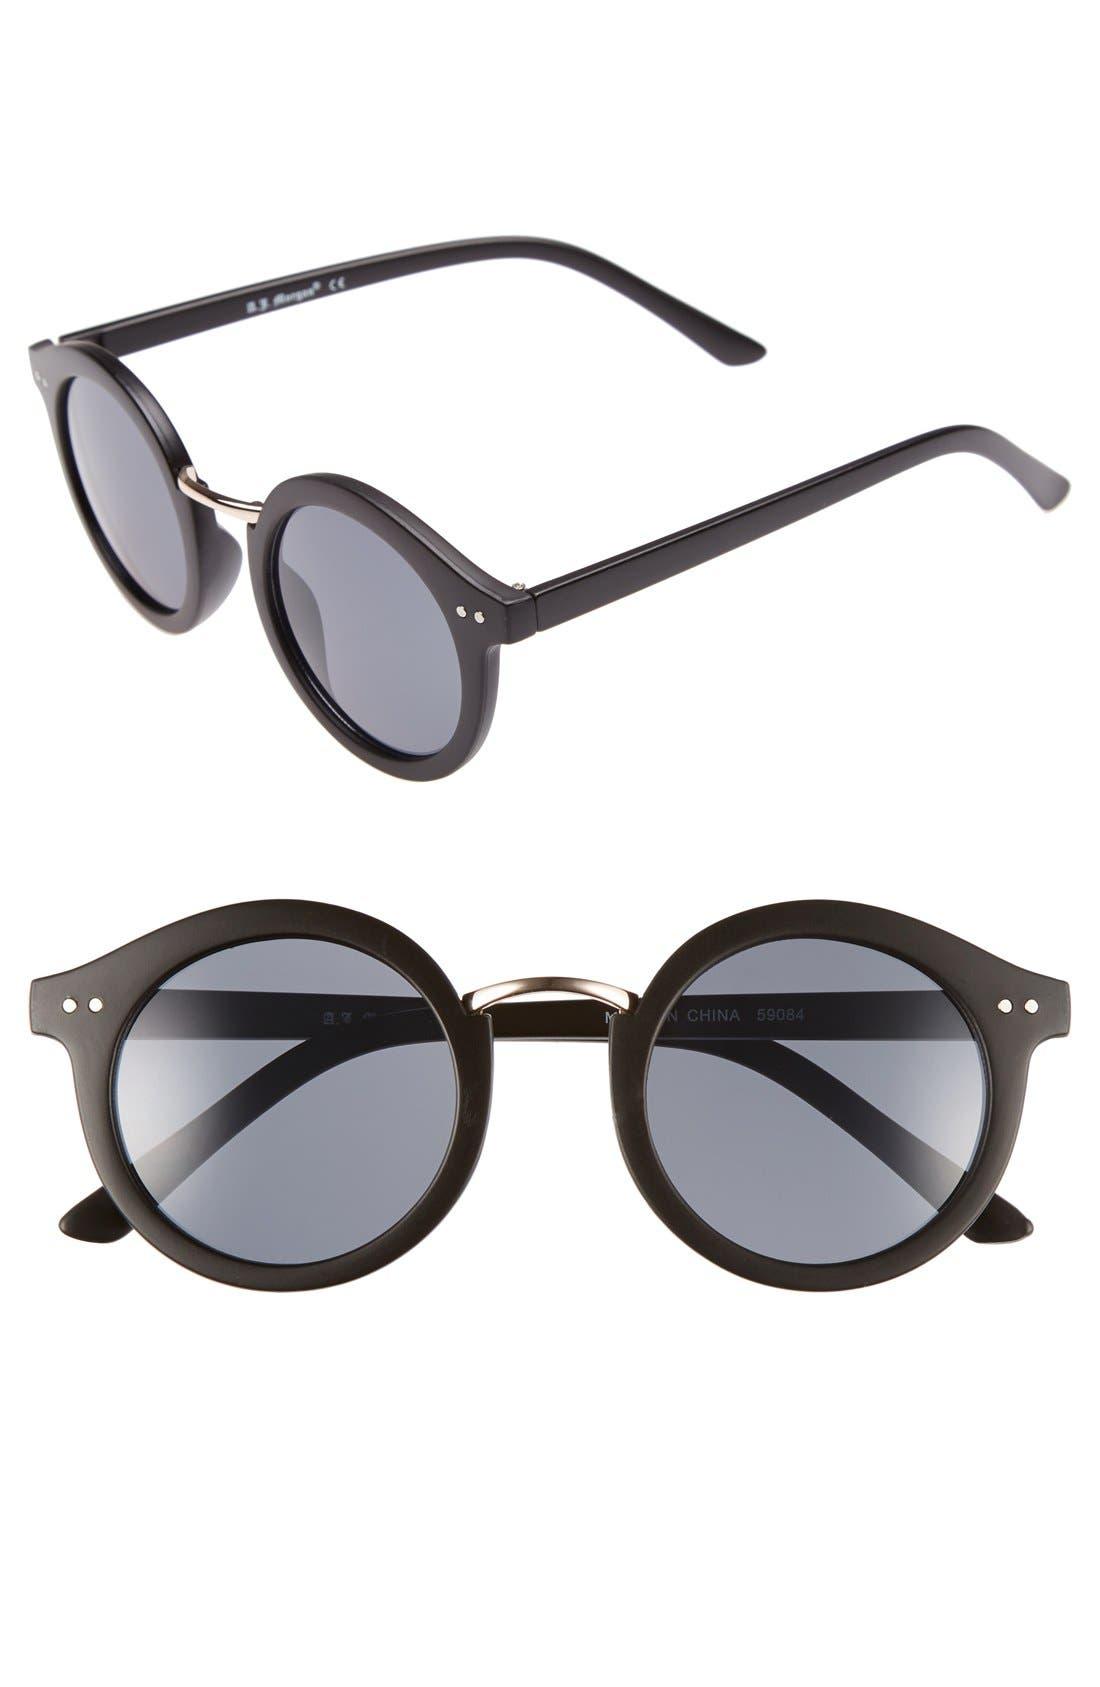 Main Image - A.J. Morgan 'Randall' 46mm Sunglasses